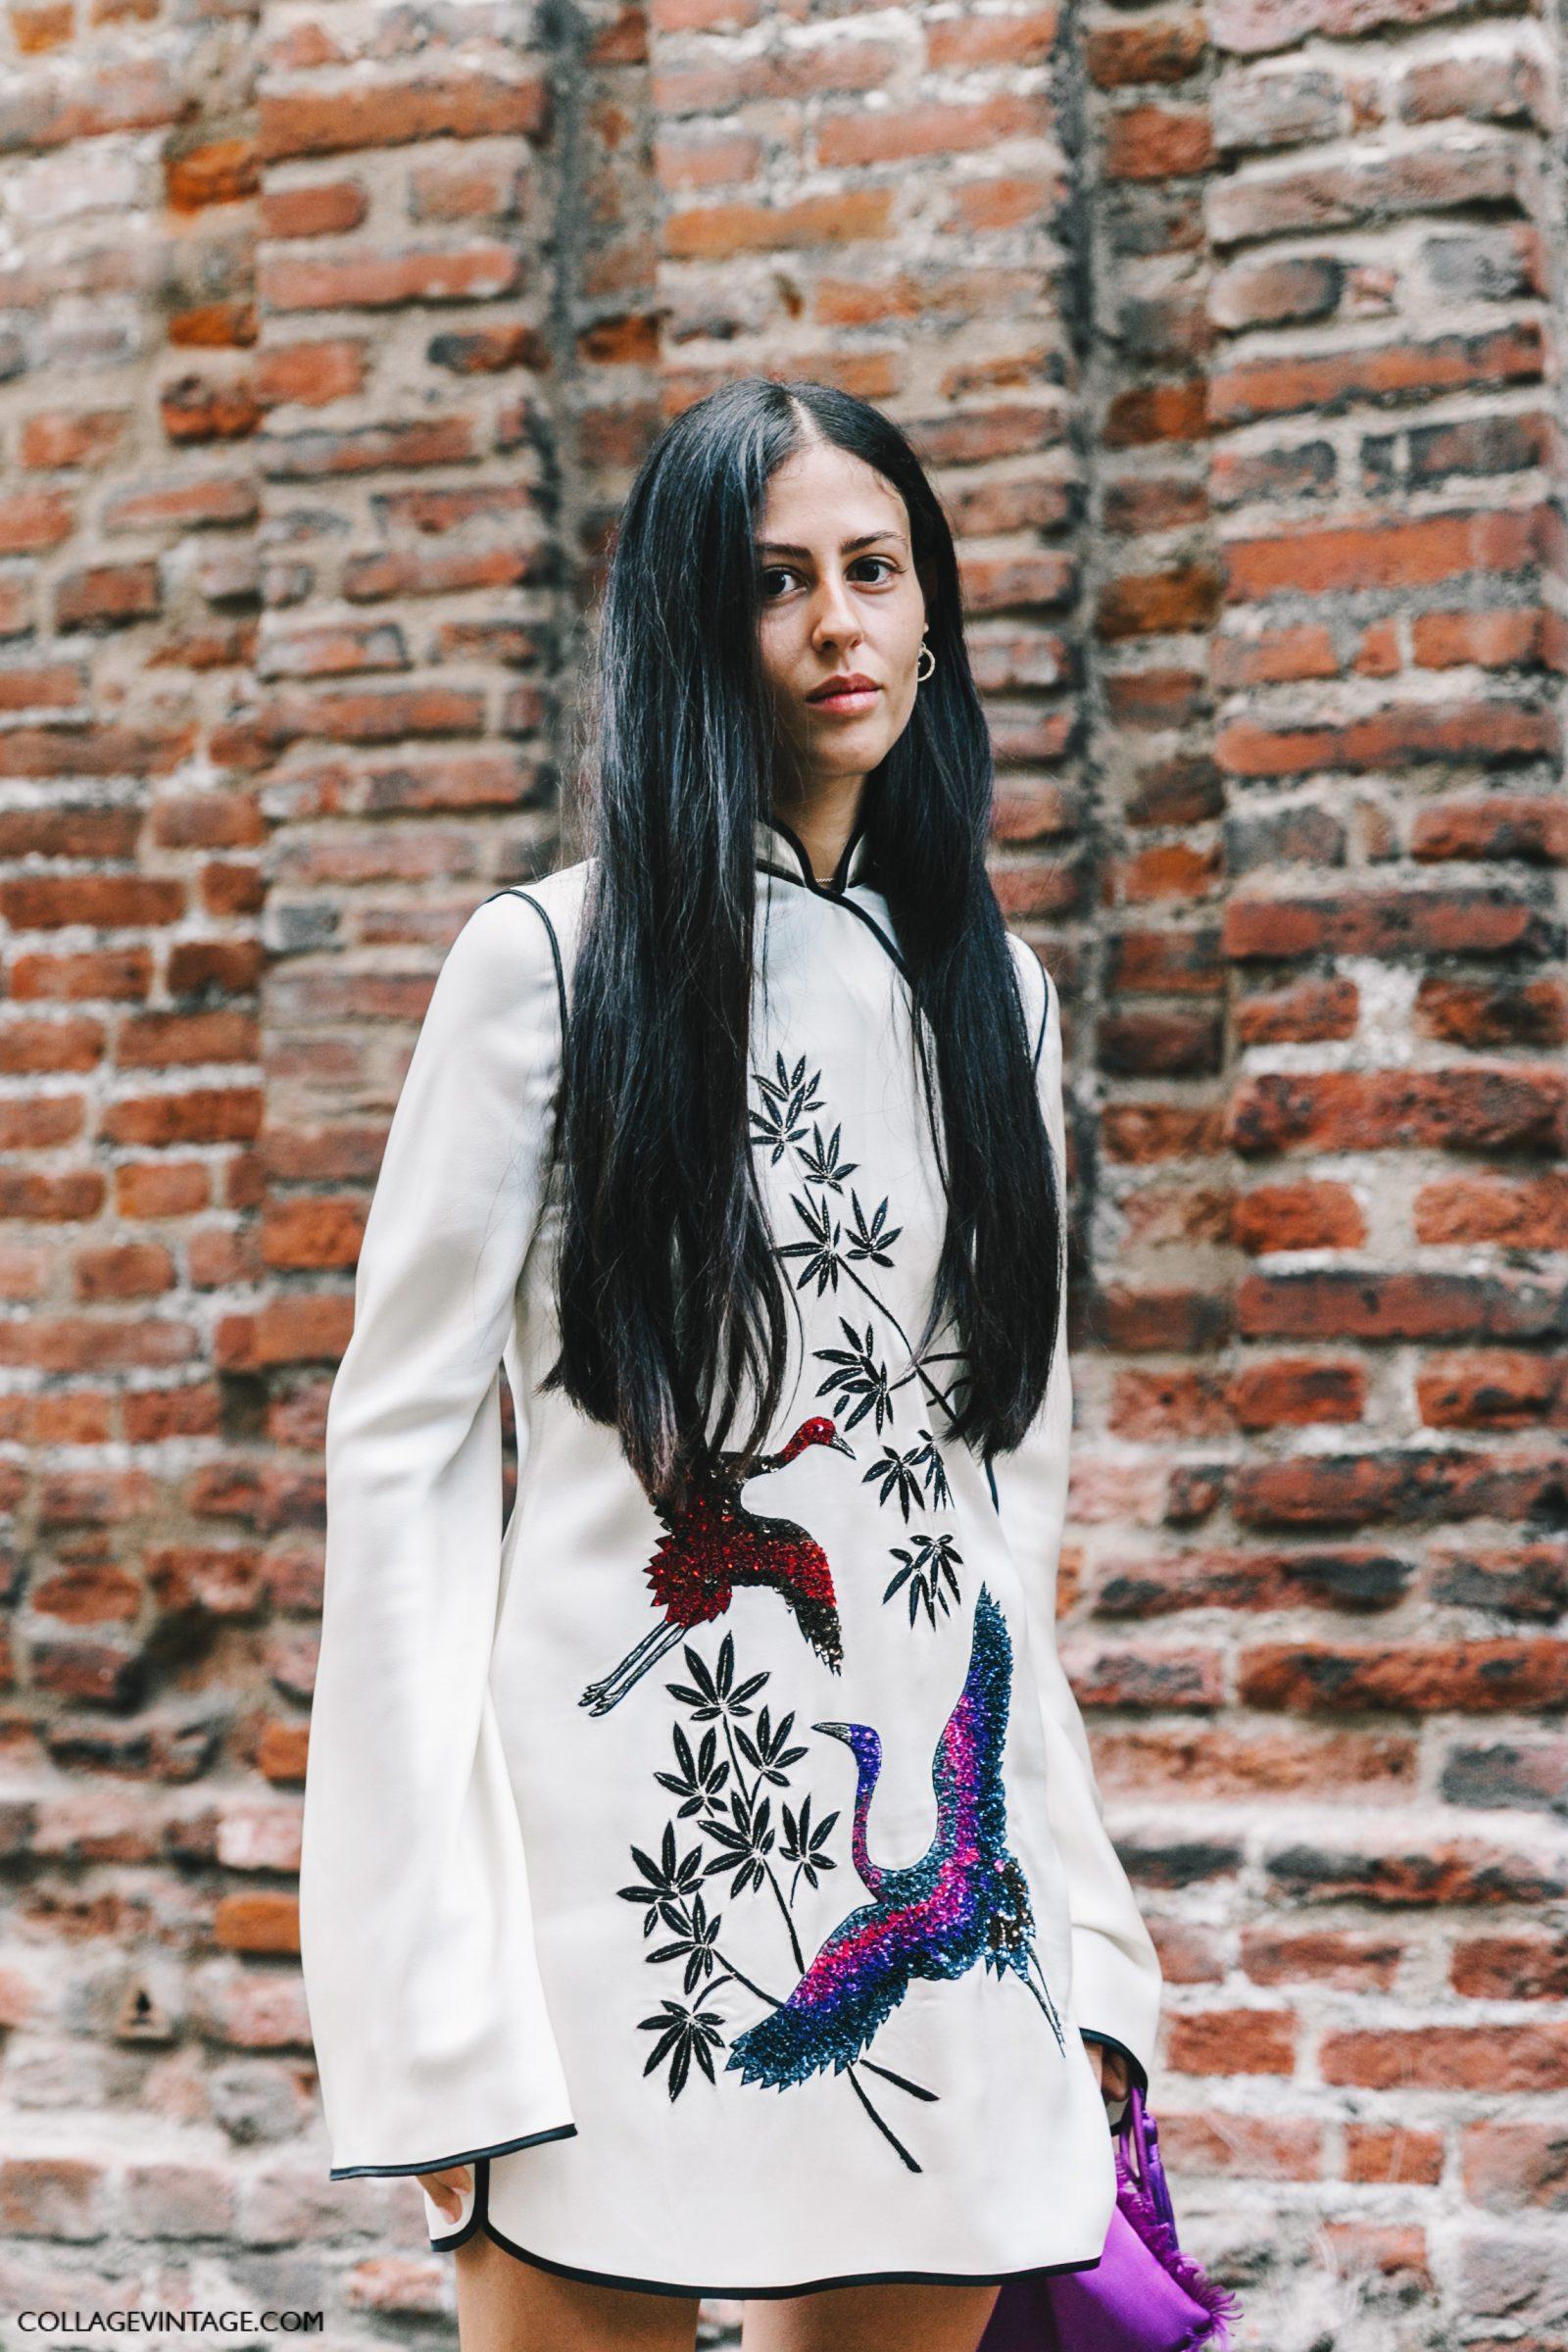 mfw-milan_fashion_week_ss17-street_style-outfits-collage_vintage-gucci-numero_21-alberta_ferreti-157